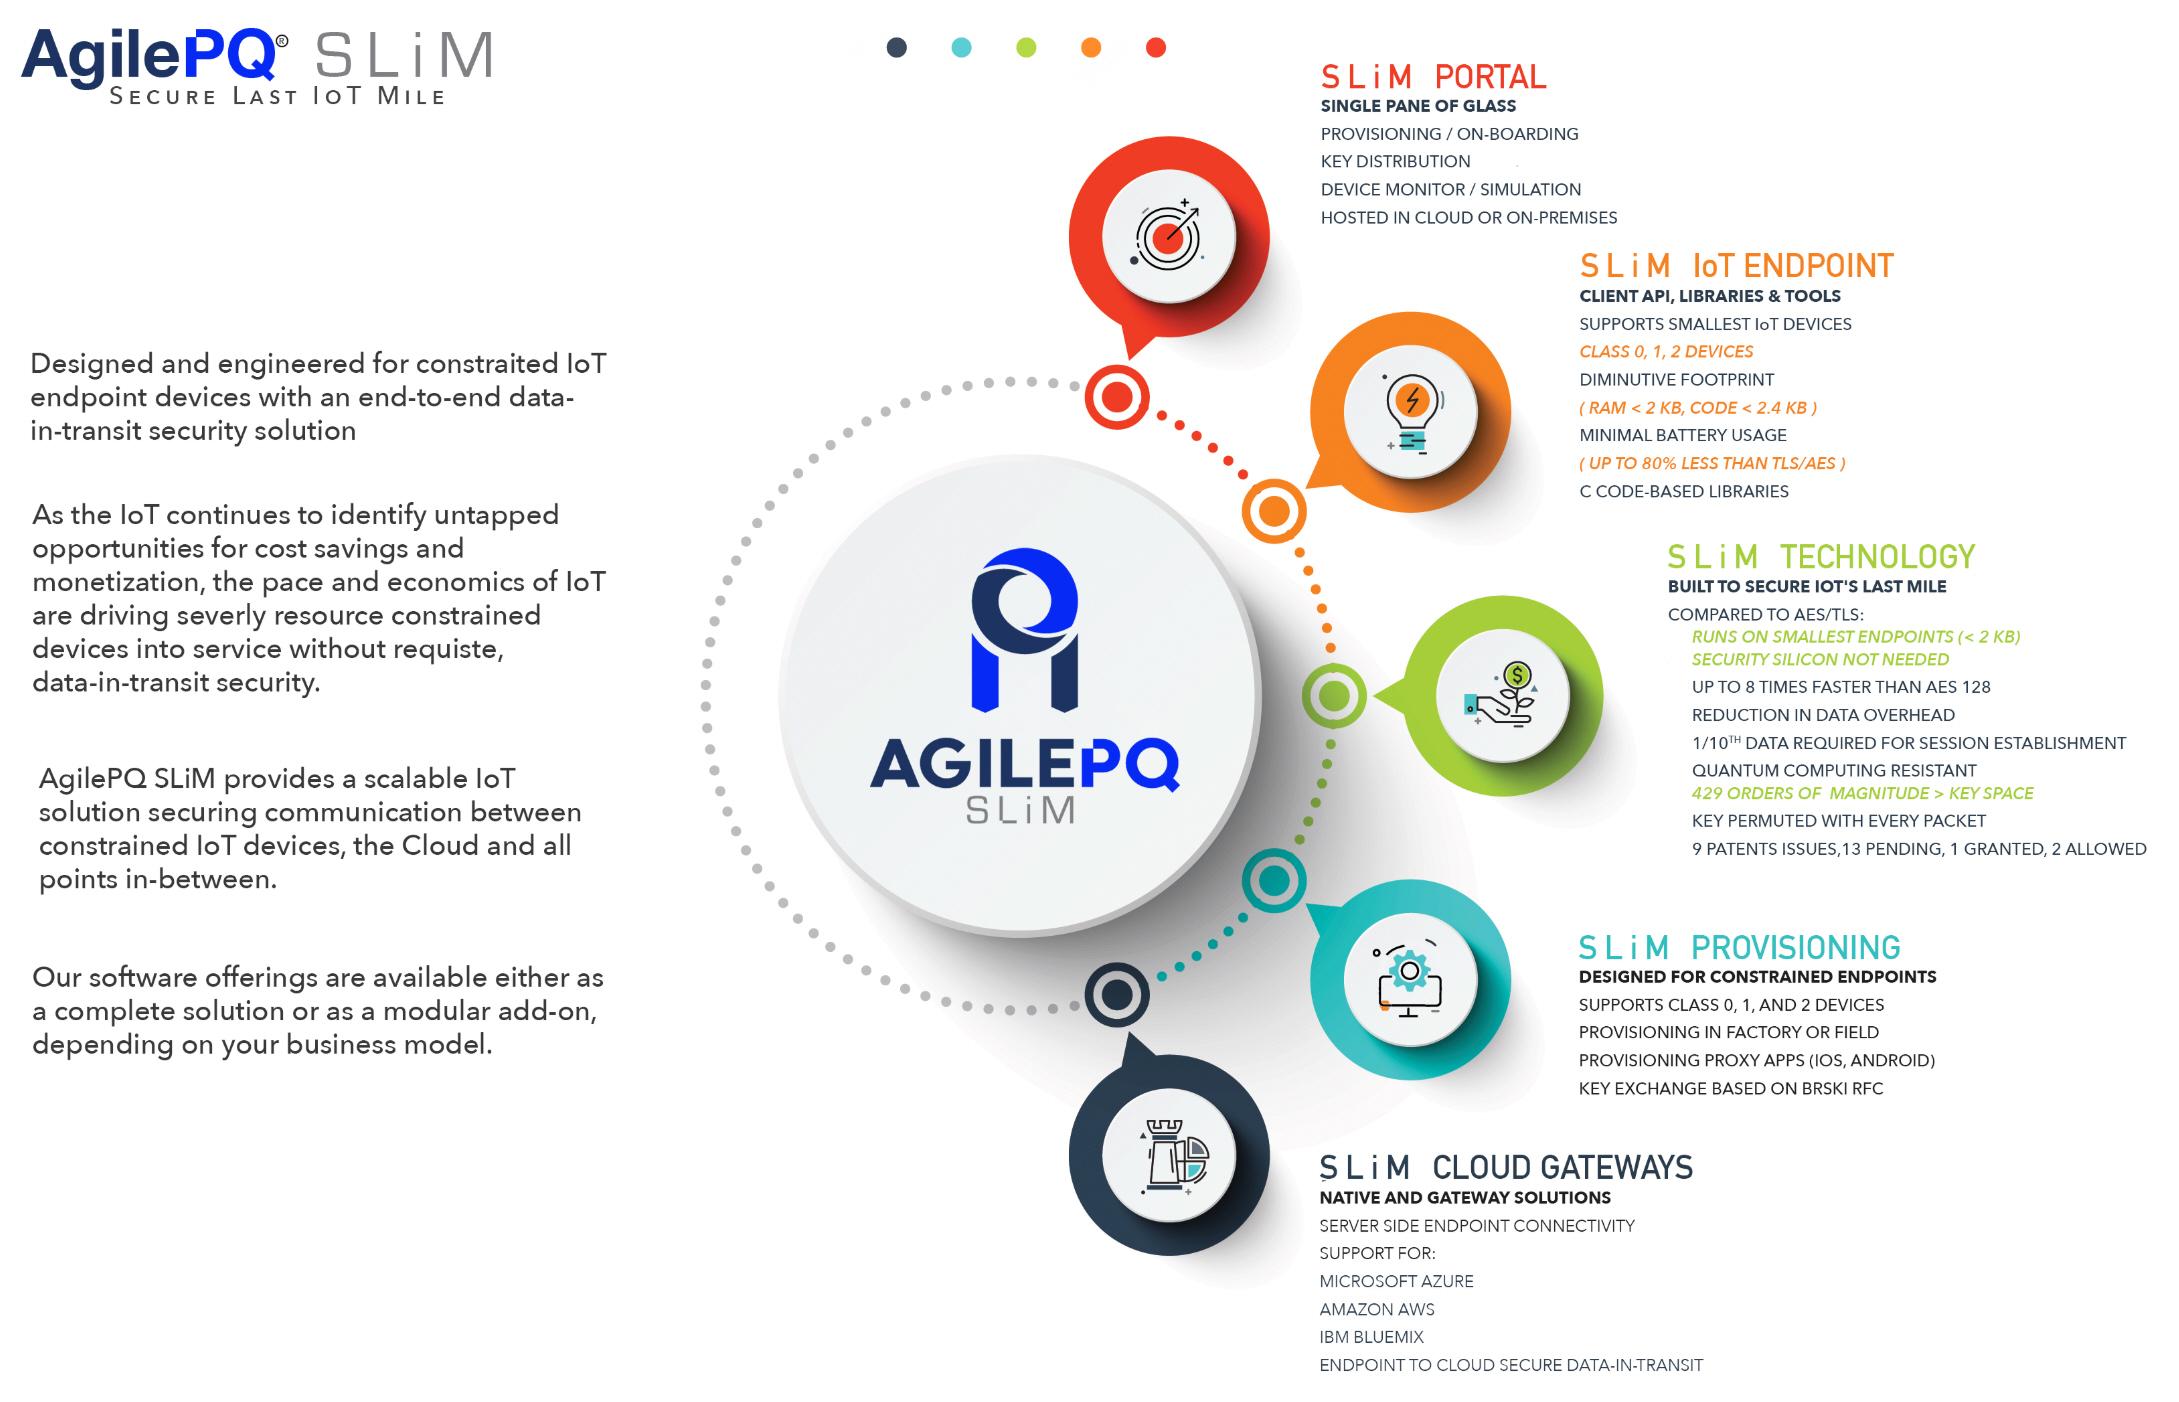 agilepq announces revolutionary breakthrough in iot endpoint security